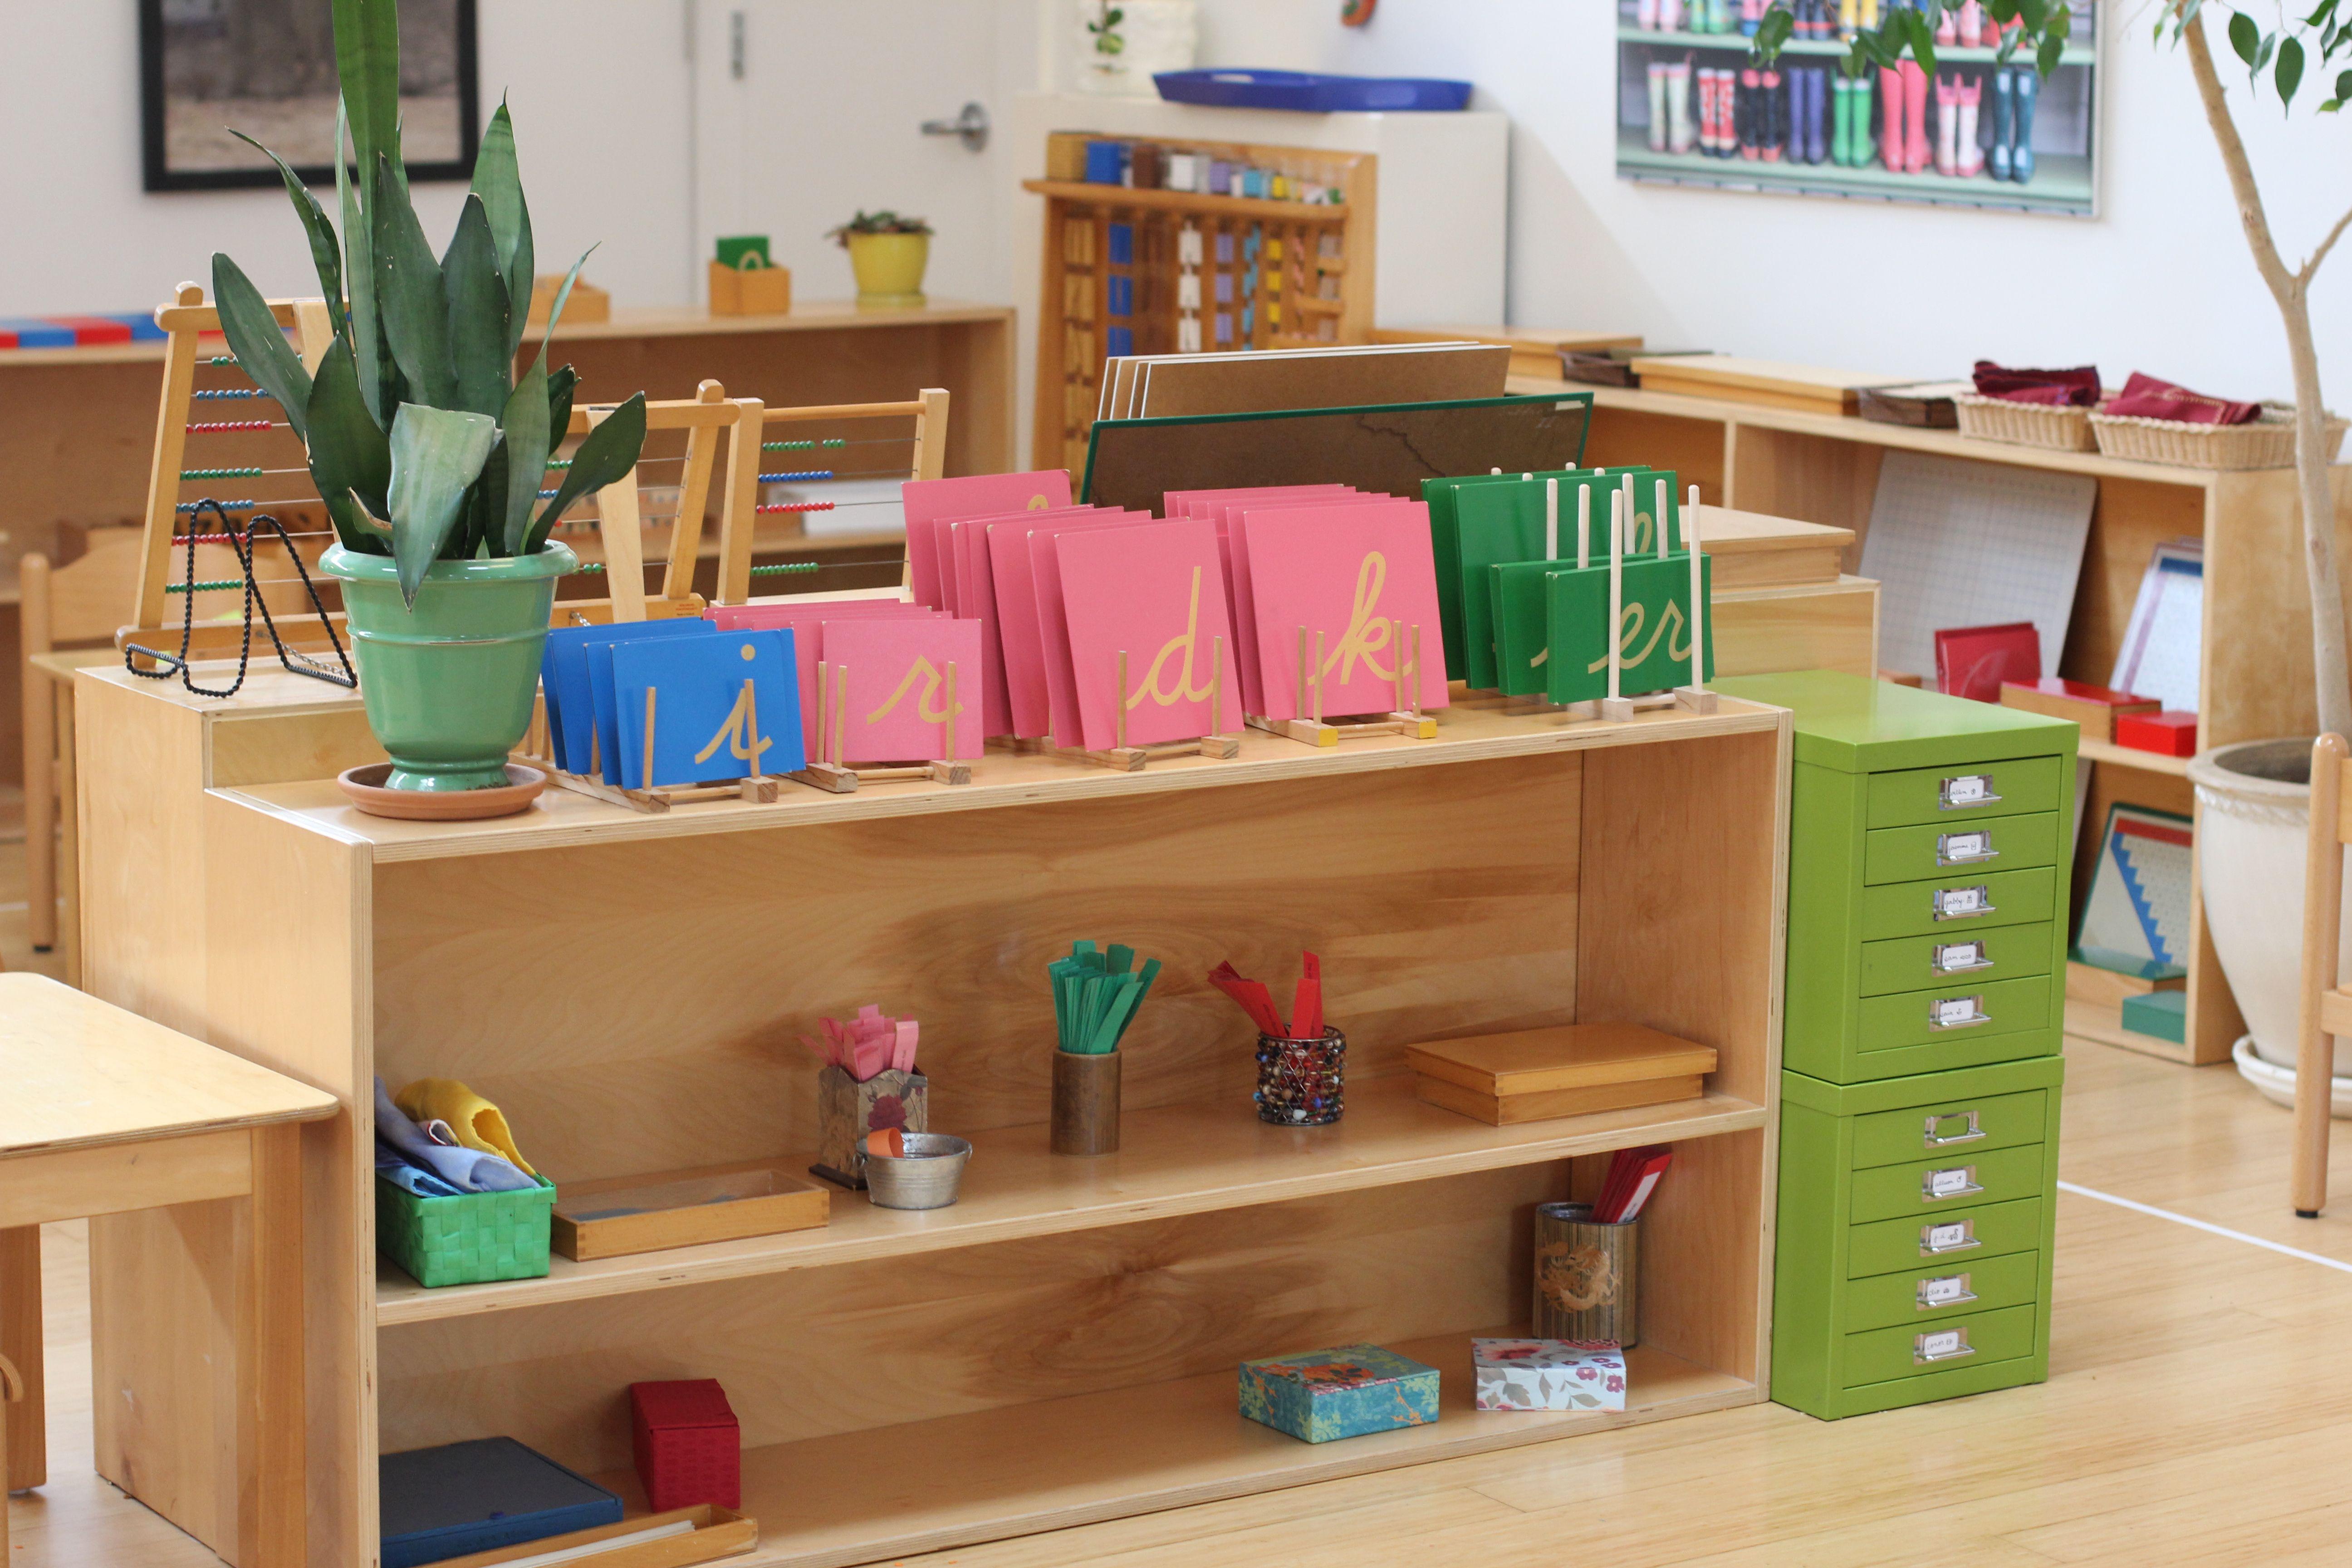 Montessori Classroom Design Pictures : Montessori classroom ii pre k layout pinterest